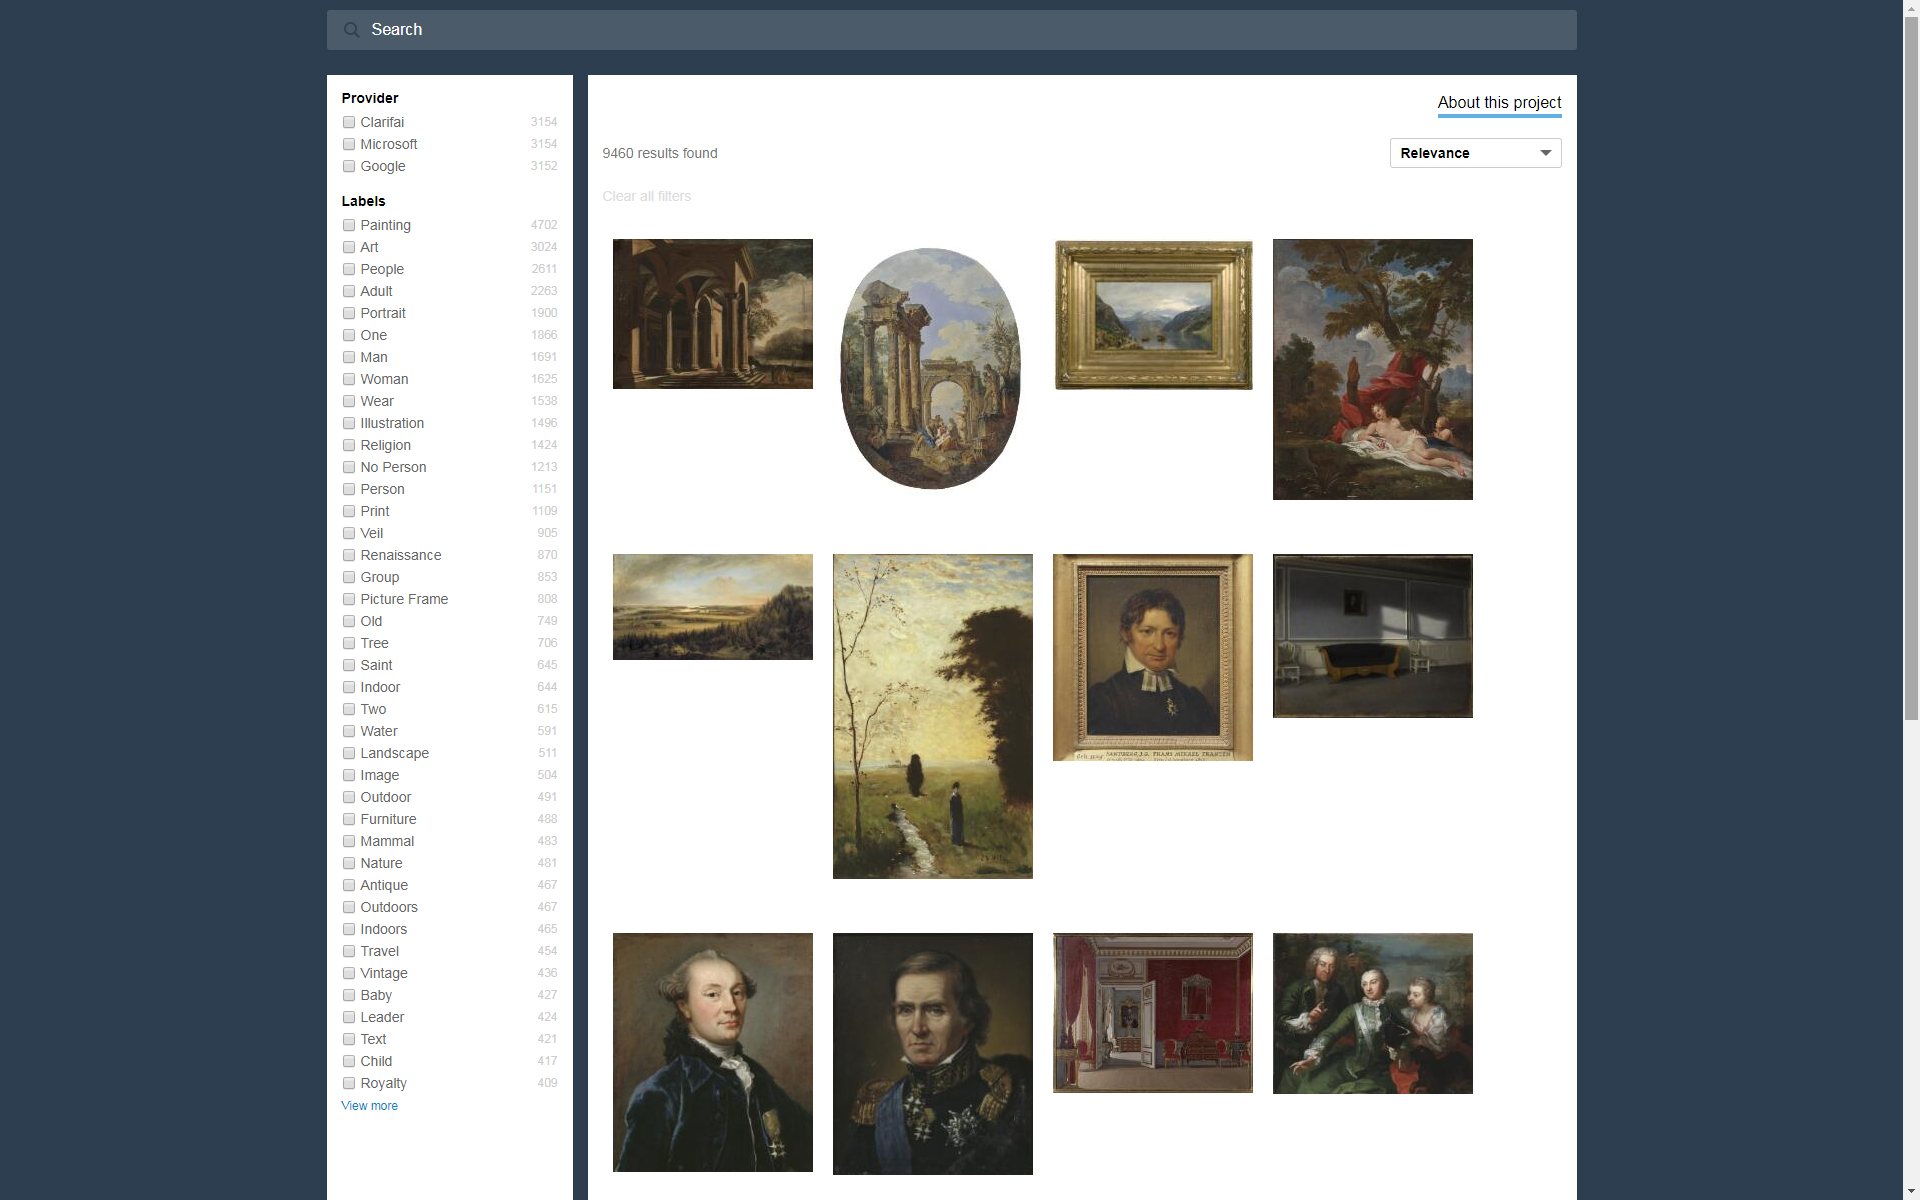 Automated image analysis with IIIF | Europeana Pro